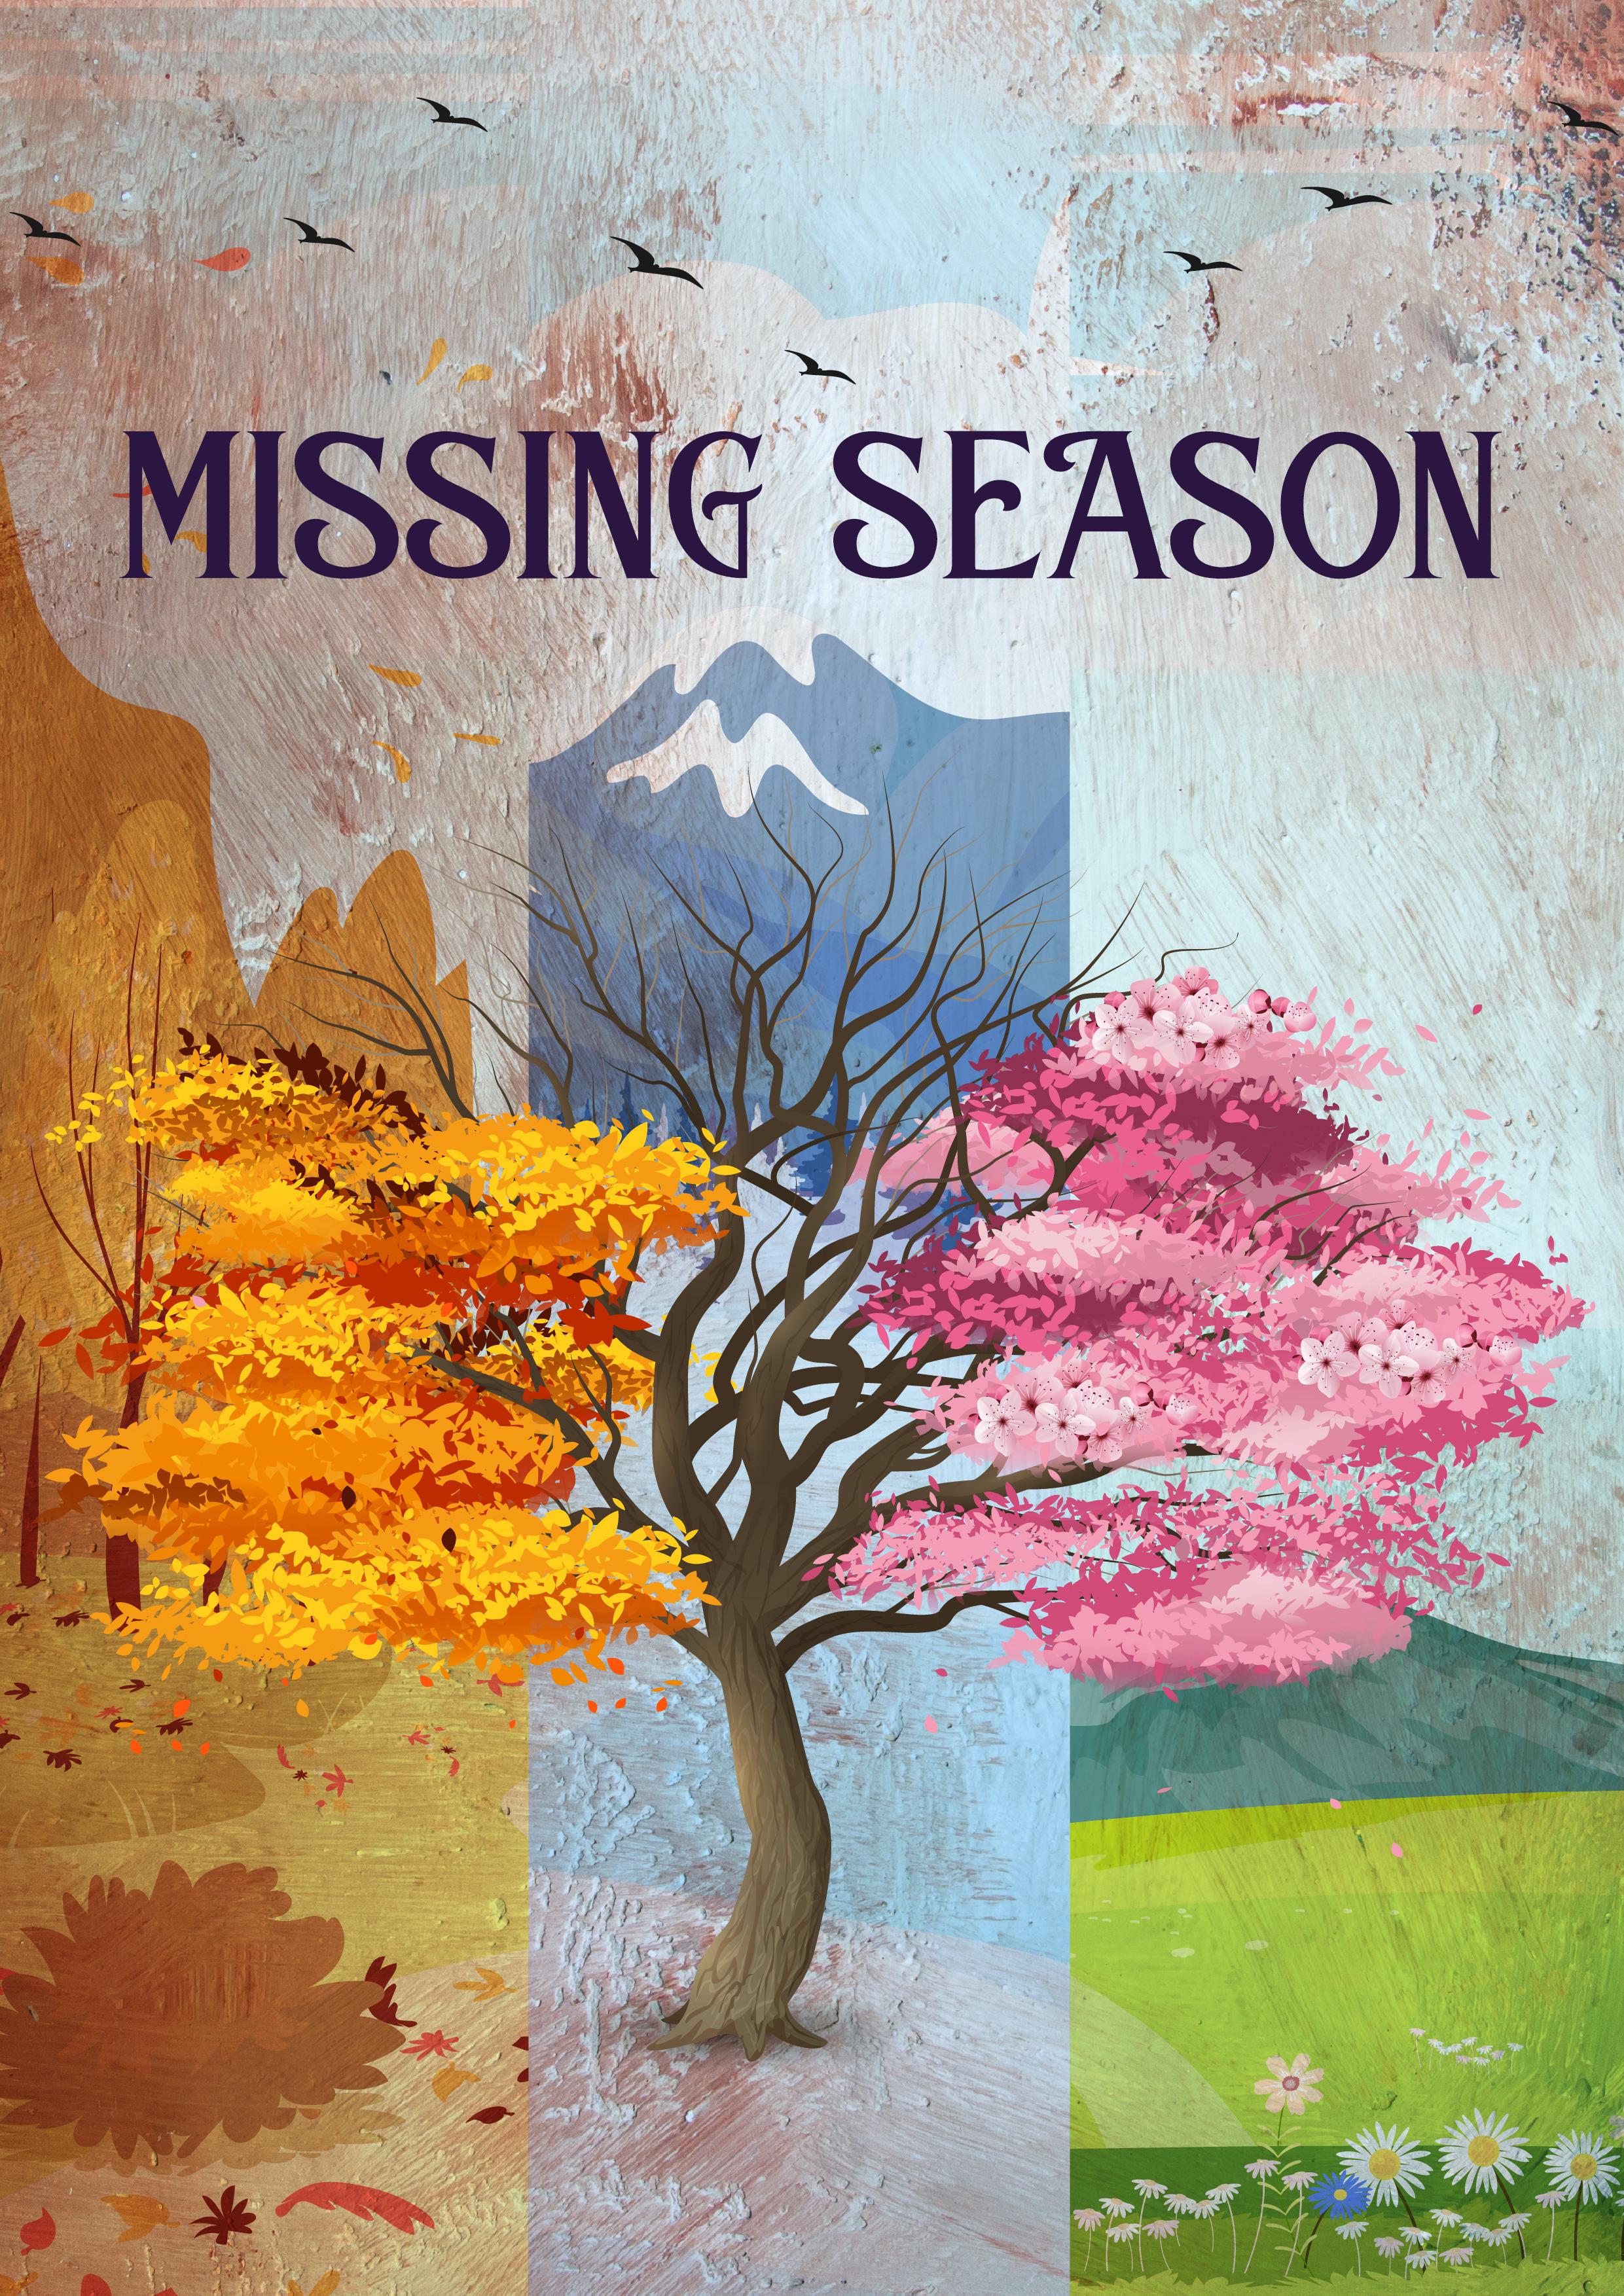 Missing Season Poster